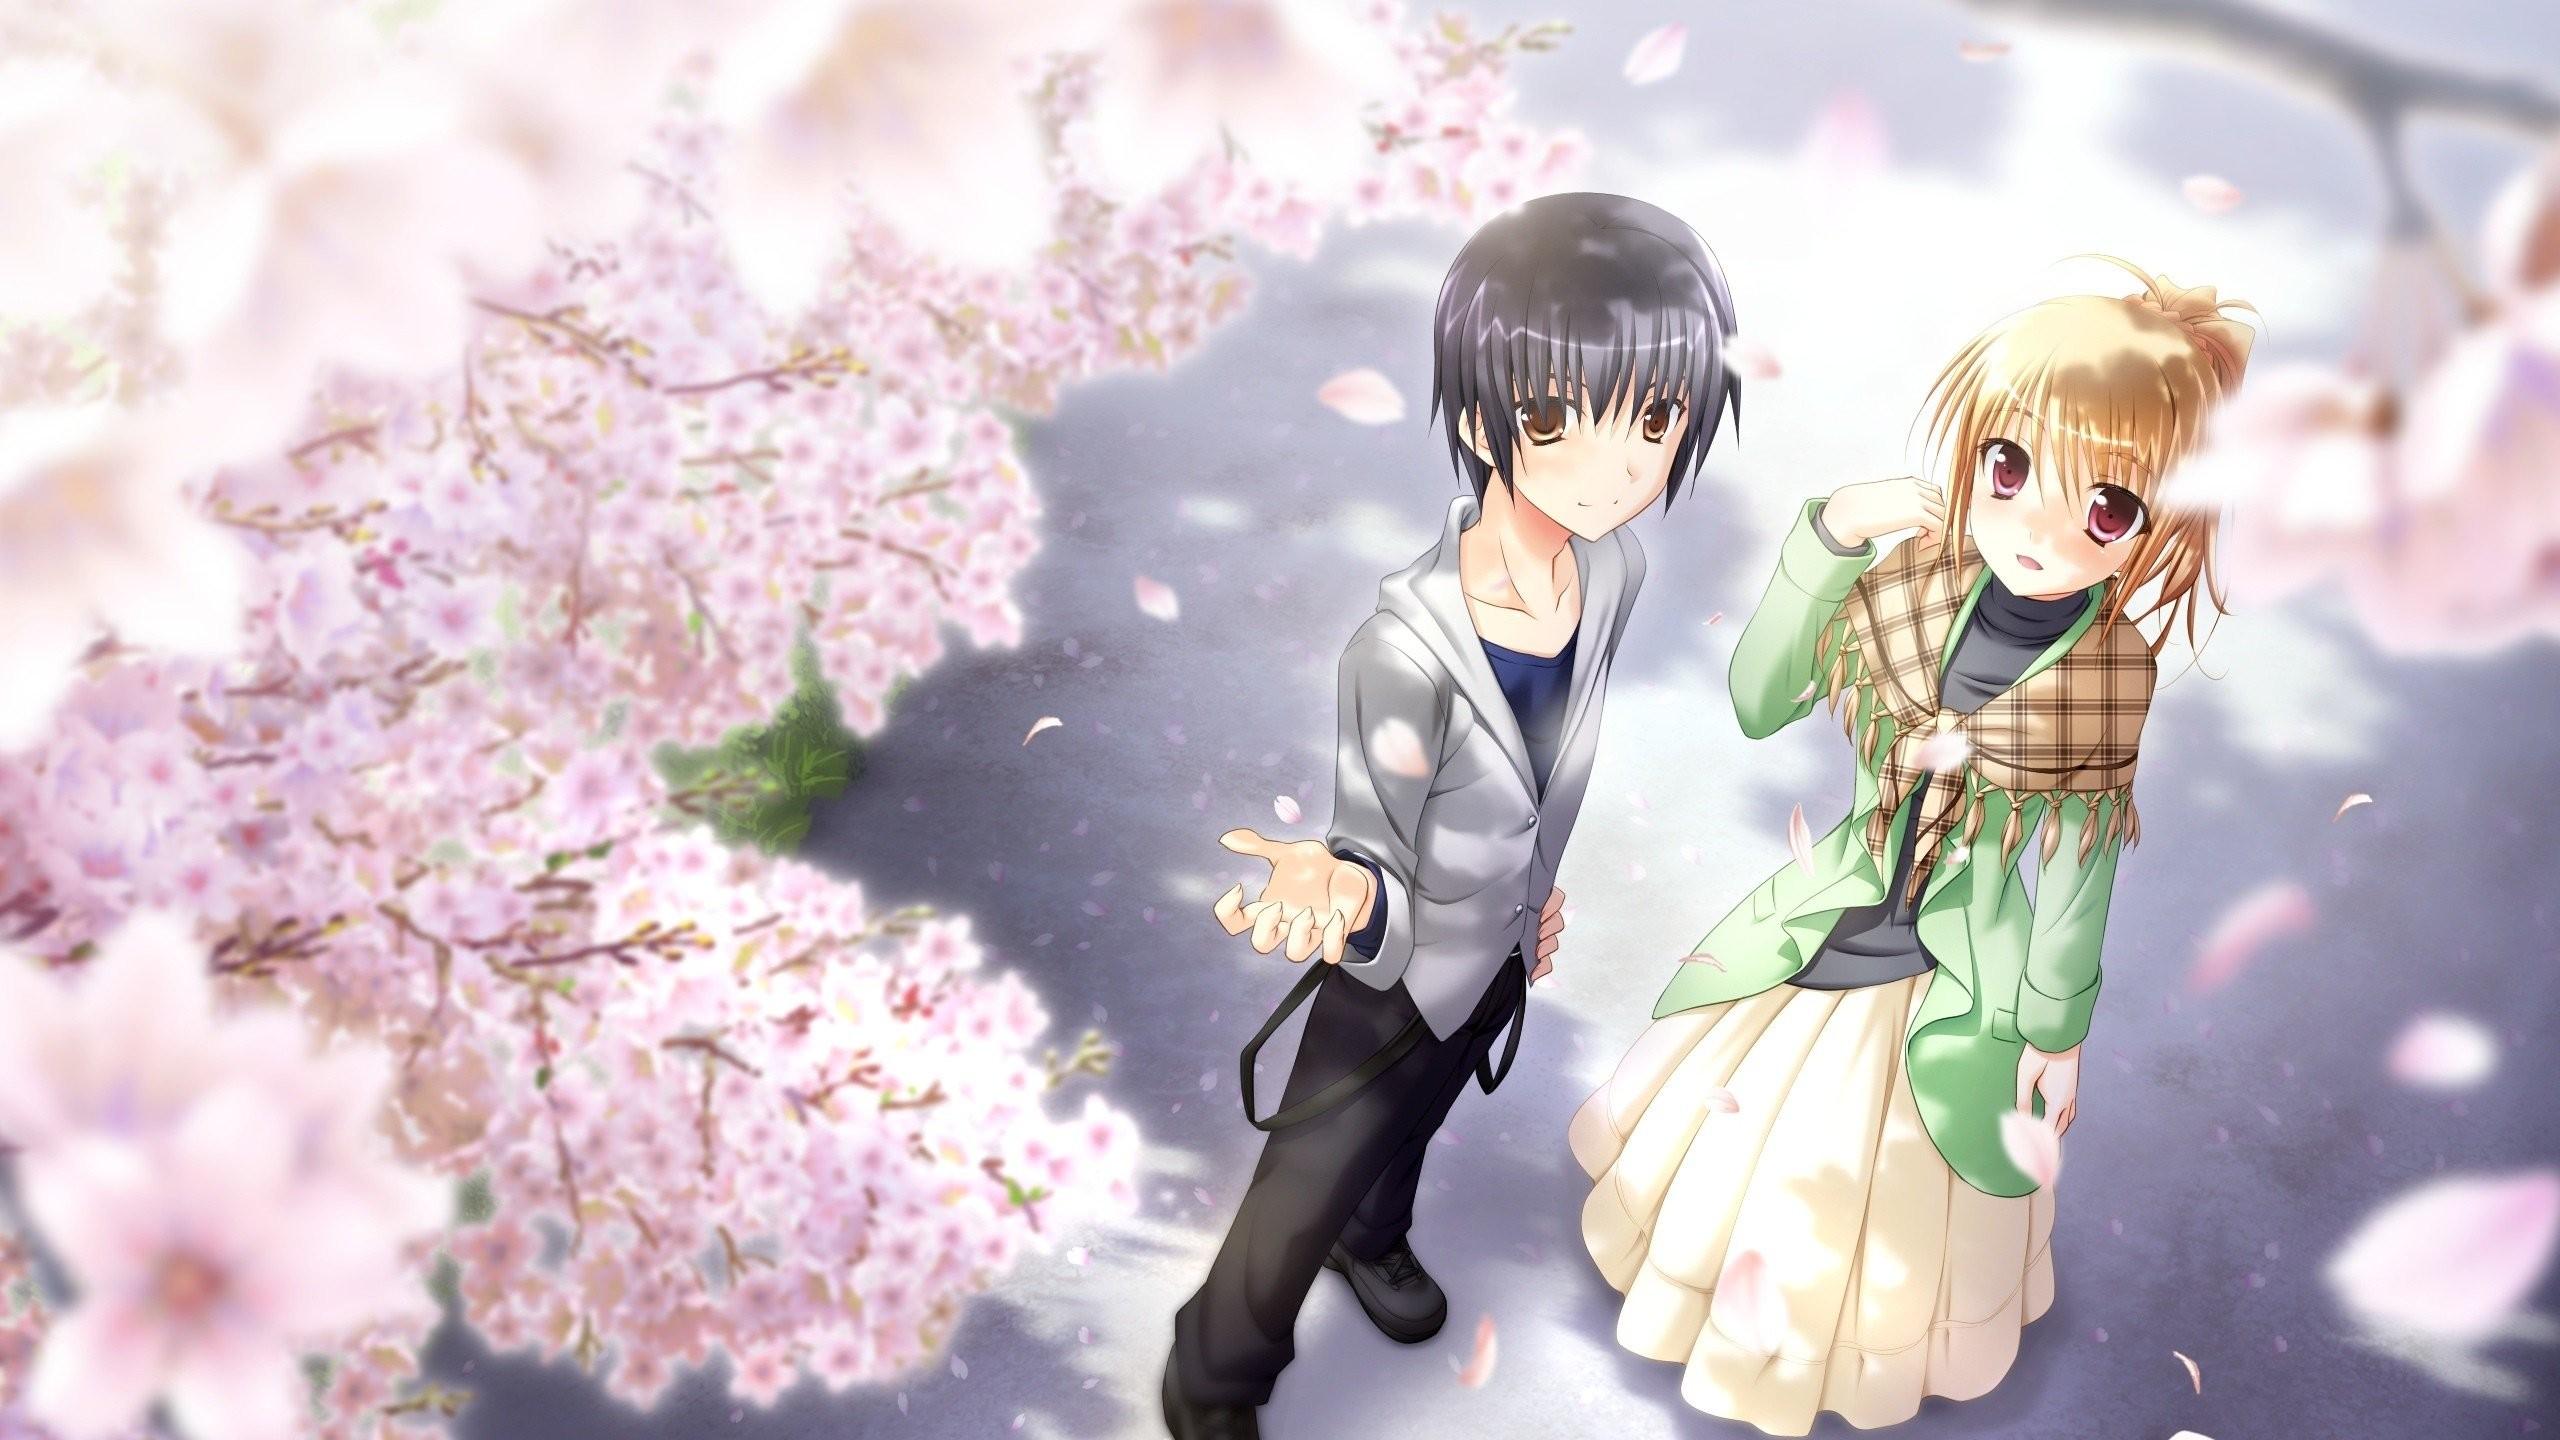 Res: 2560x1440, cute anime desktop hd